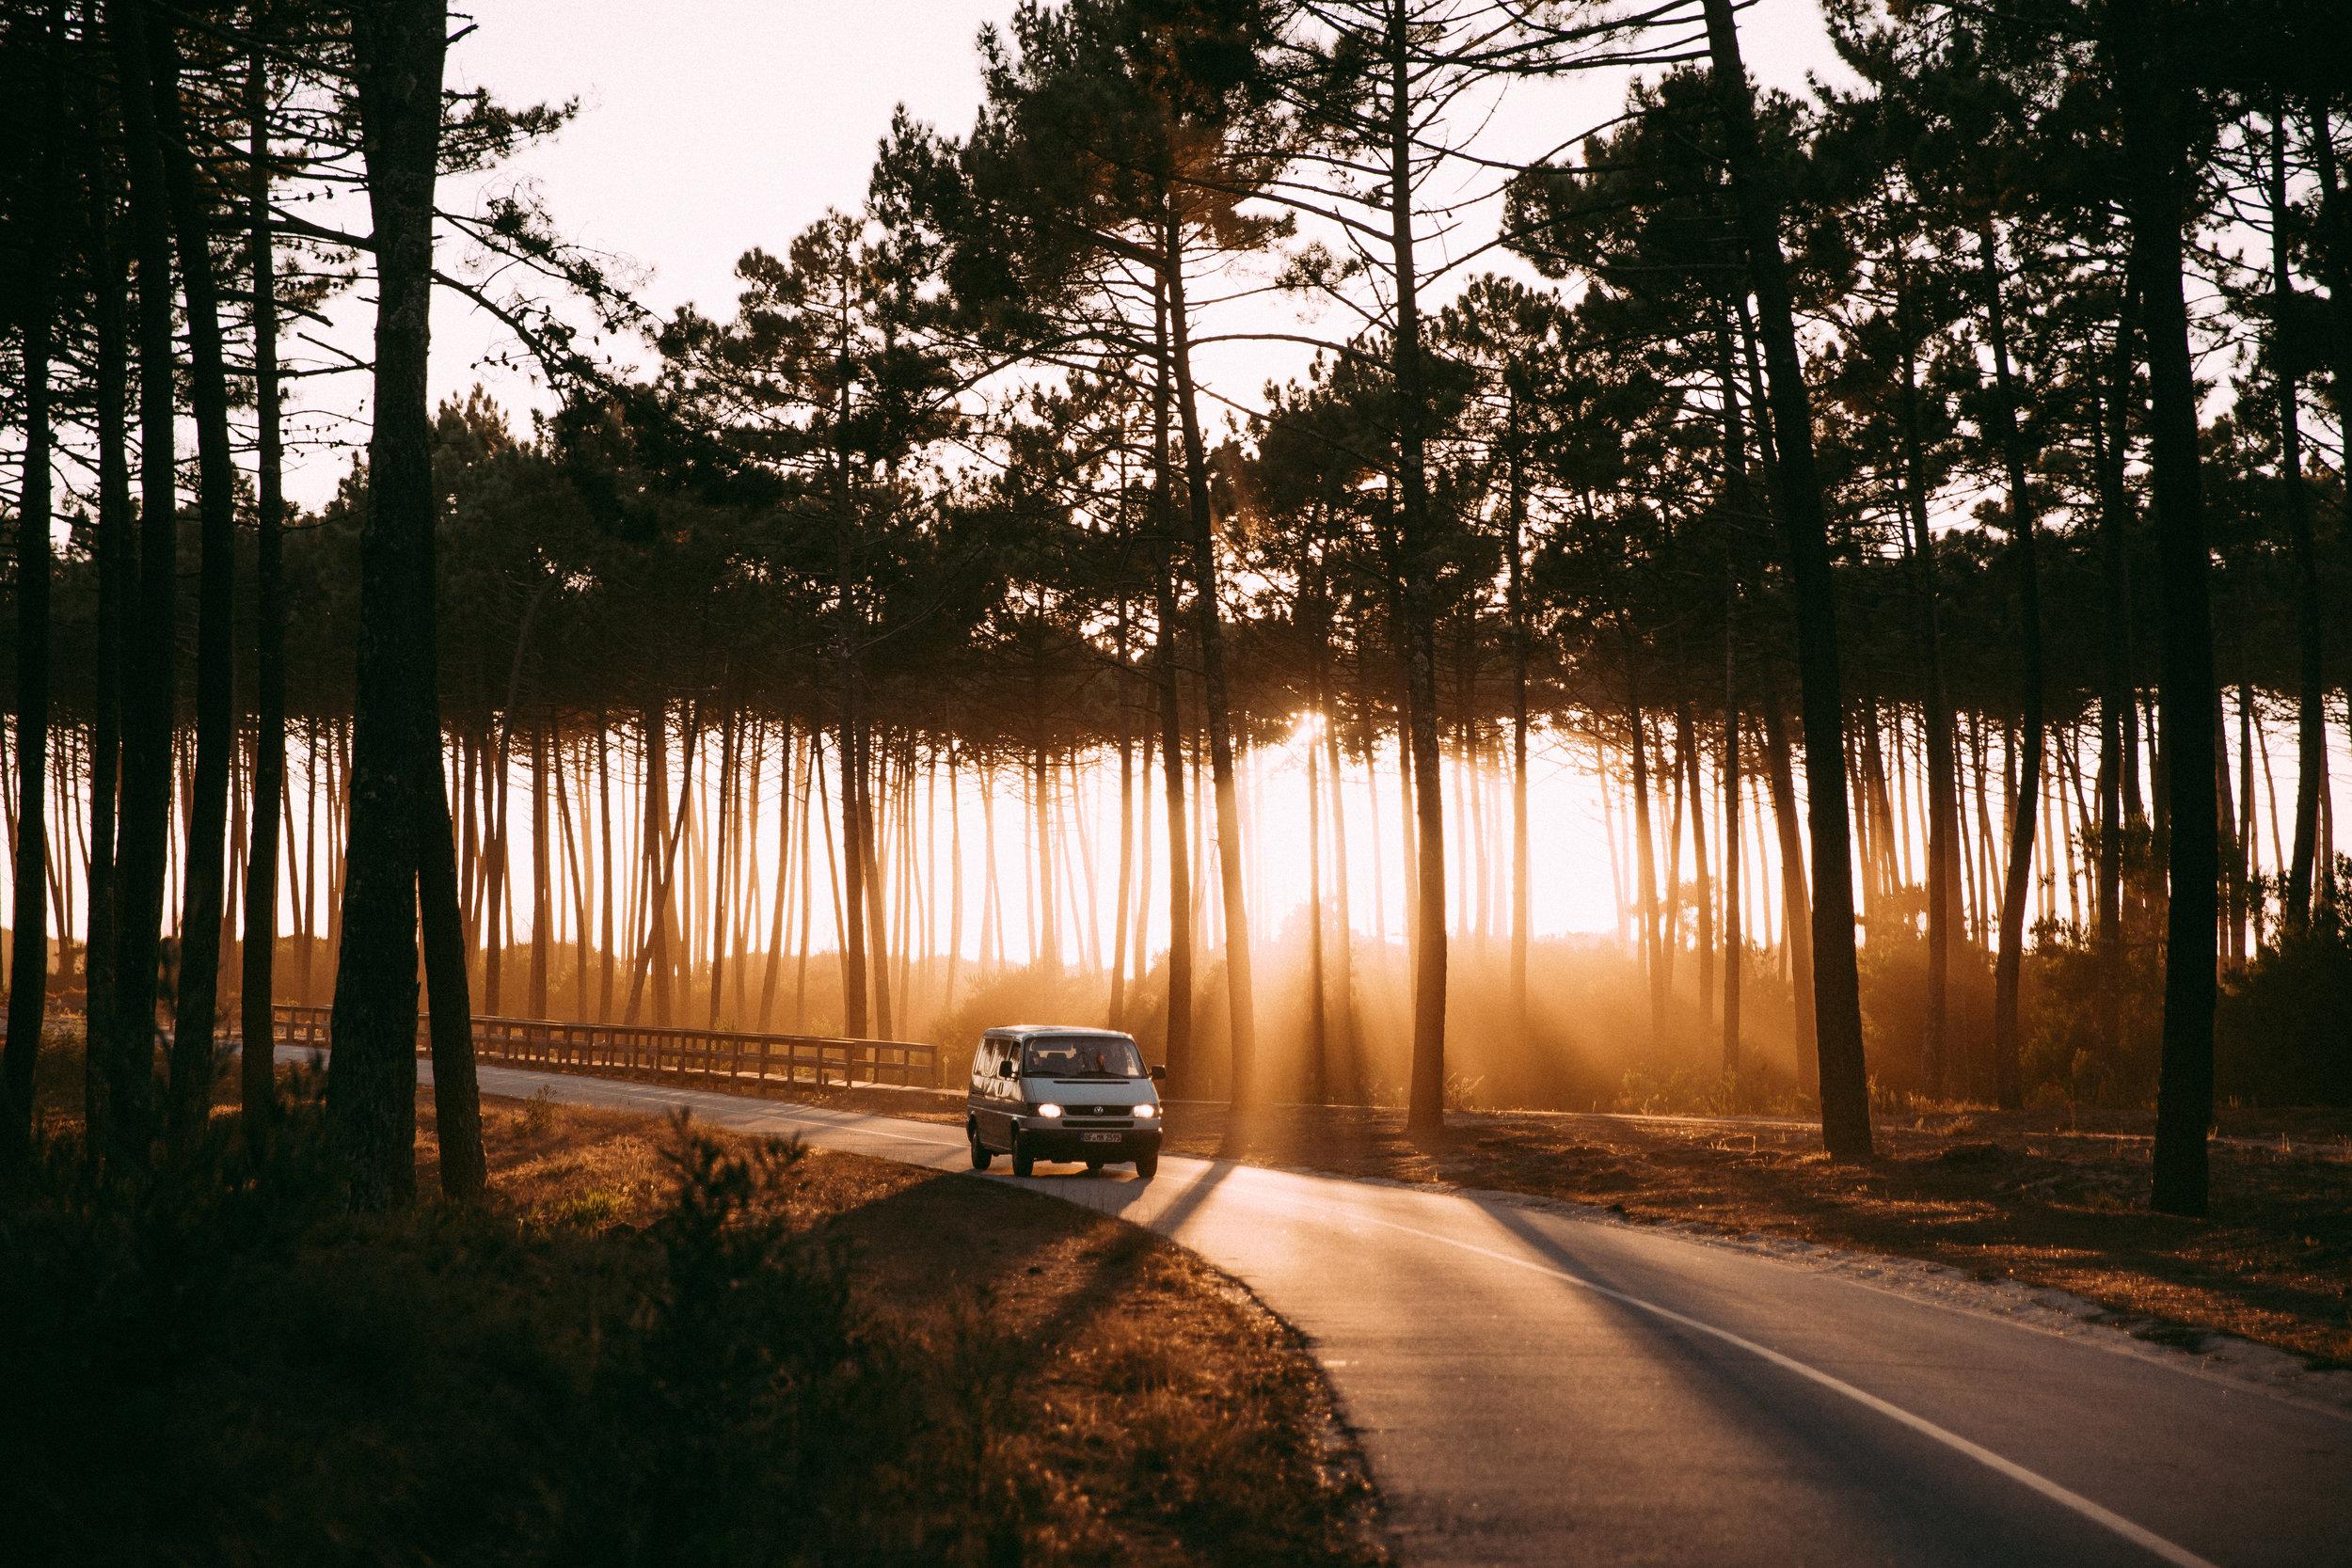 Eddi on the road - Vanlife - Abenteuer - On the road